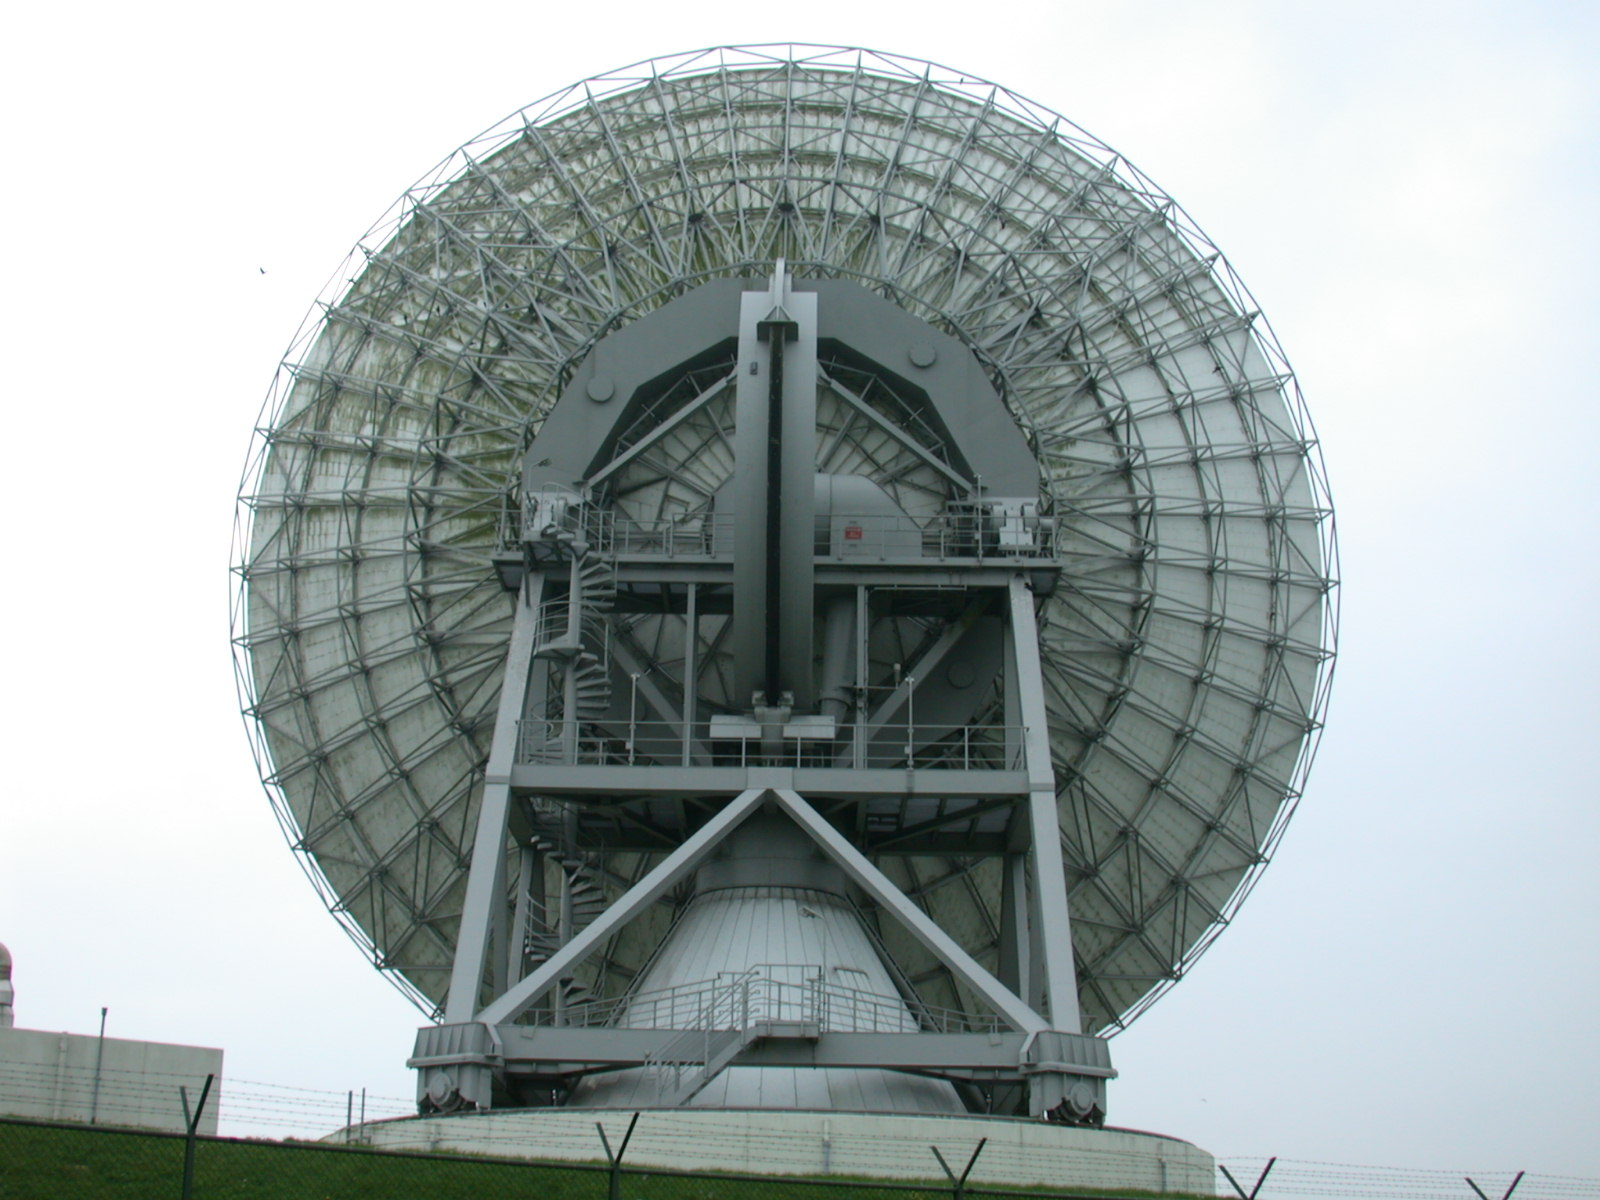 dish objects mechanics sattelite satellite telecomunications telecom communications gsm internet nasa spyware burum circkle circle rear